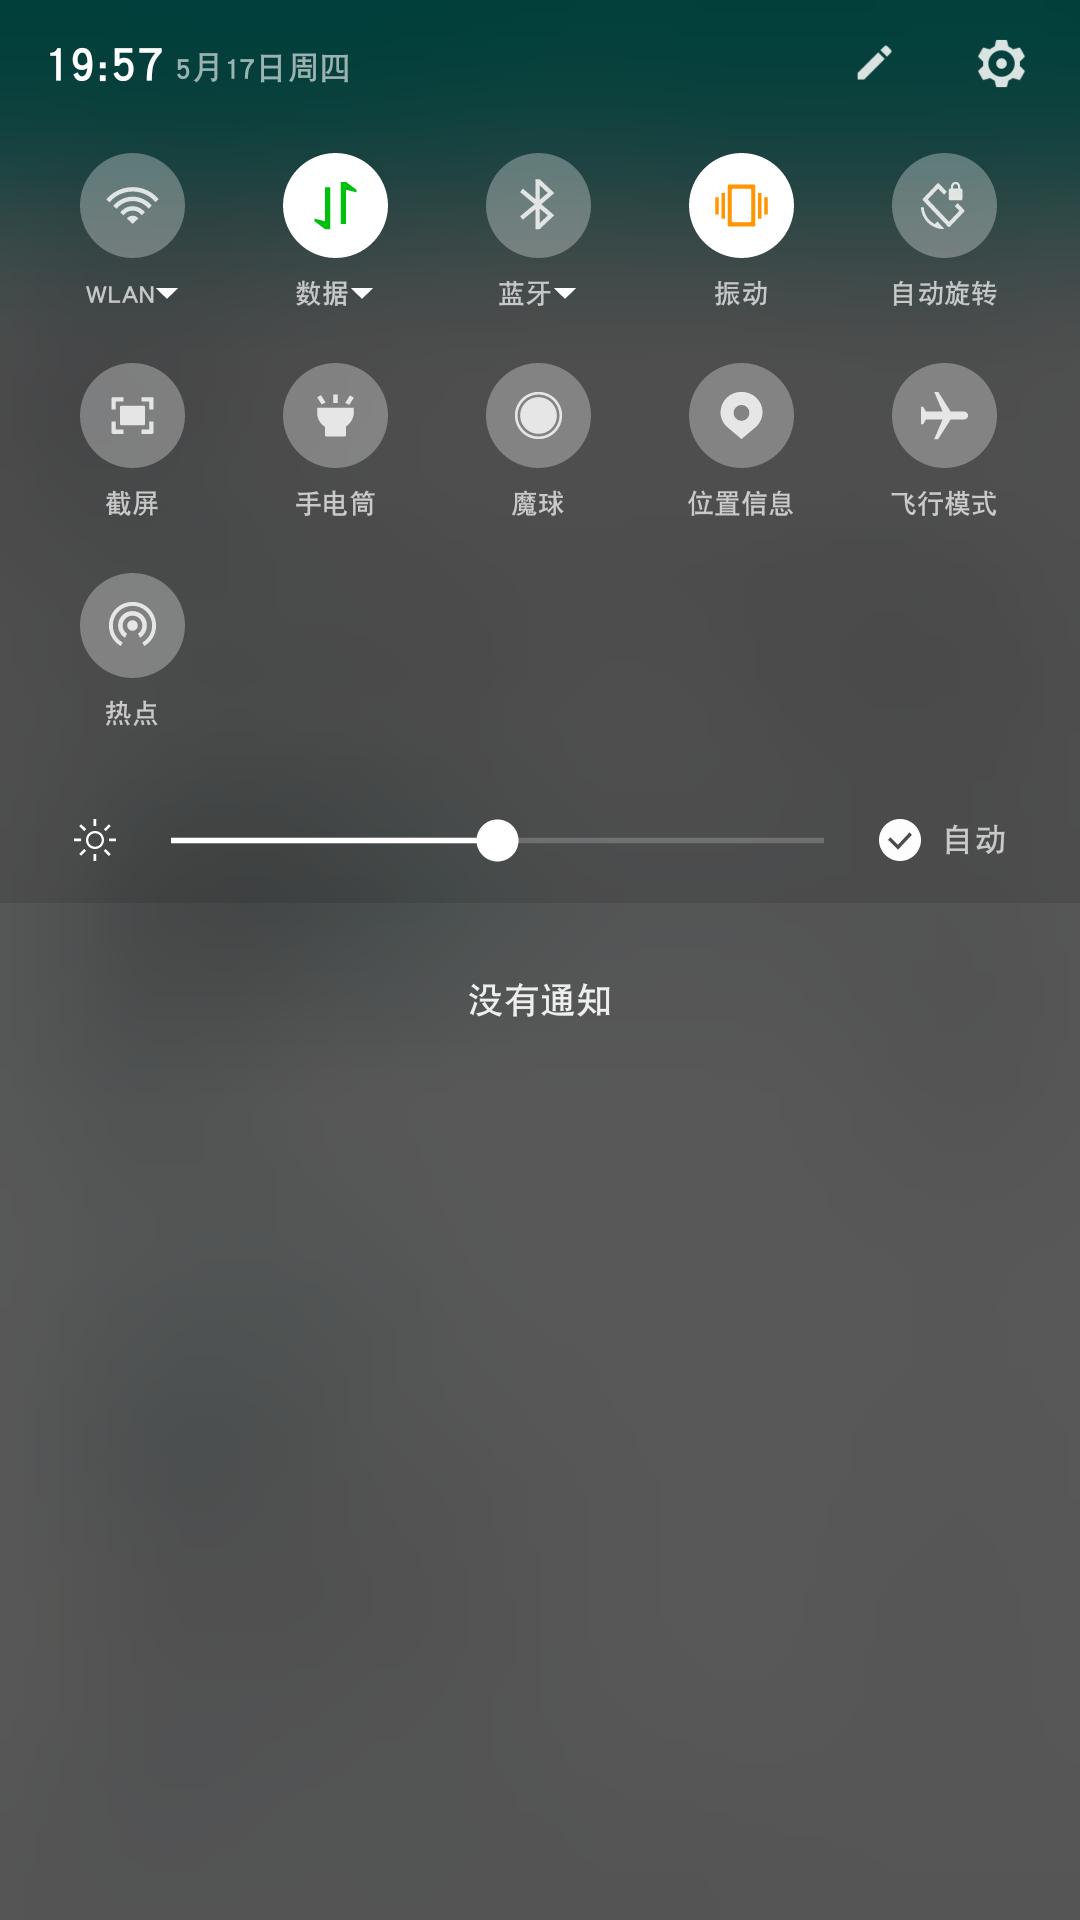 Screenshot_2018-05-17-19-57-30.png